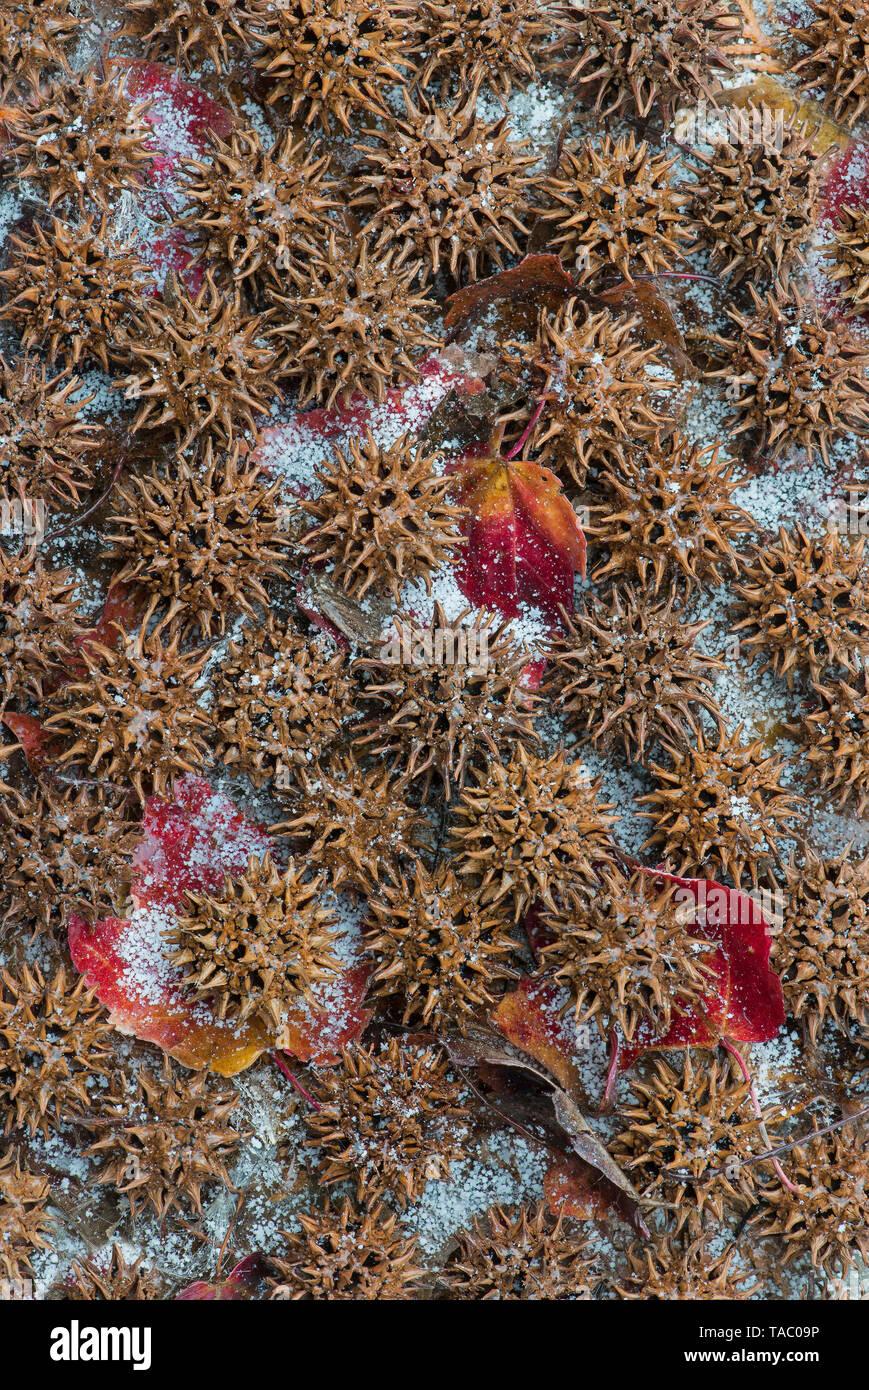 American Sweet Gum (Liquidambar styraciflua), fruit, seed and snow, Ornamental tree, E USA, by Skip Moody/Dembinsky Photo Assoc - Stock Image